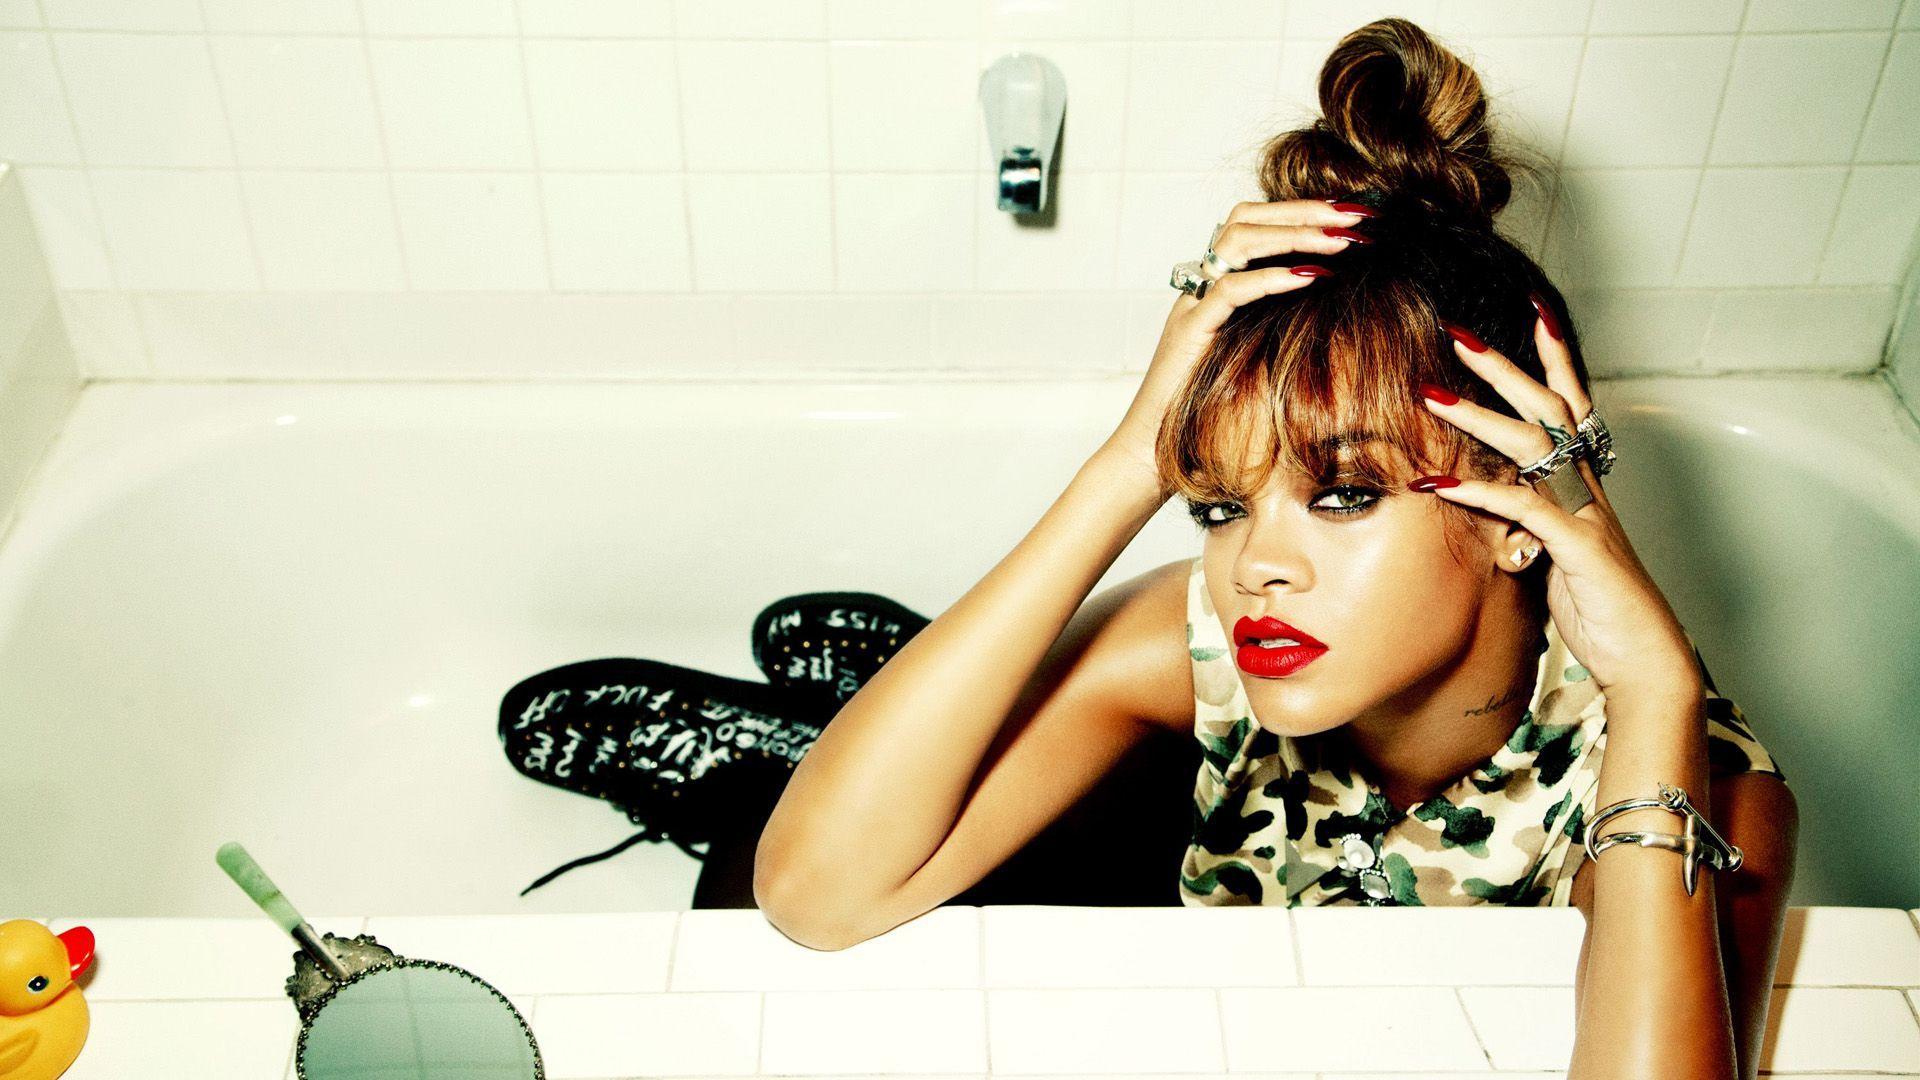 Rihanna Wallpapers - Wallpaper Cave